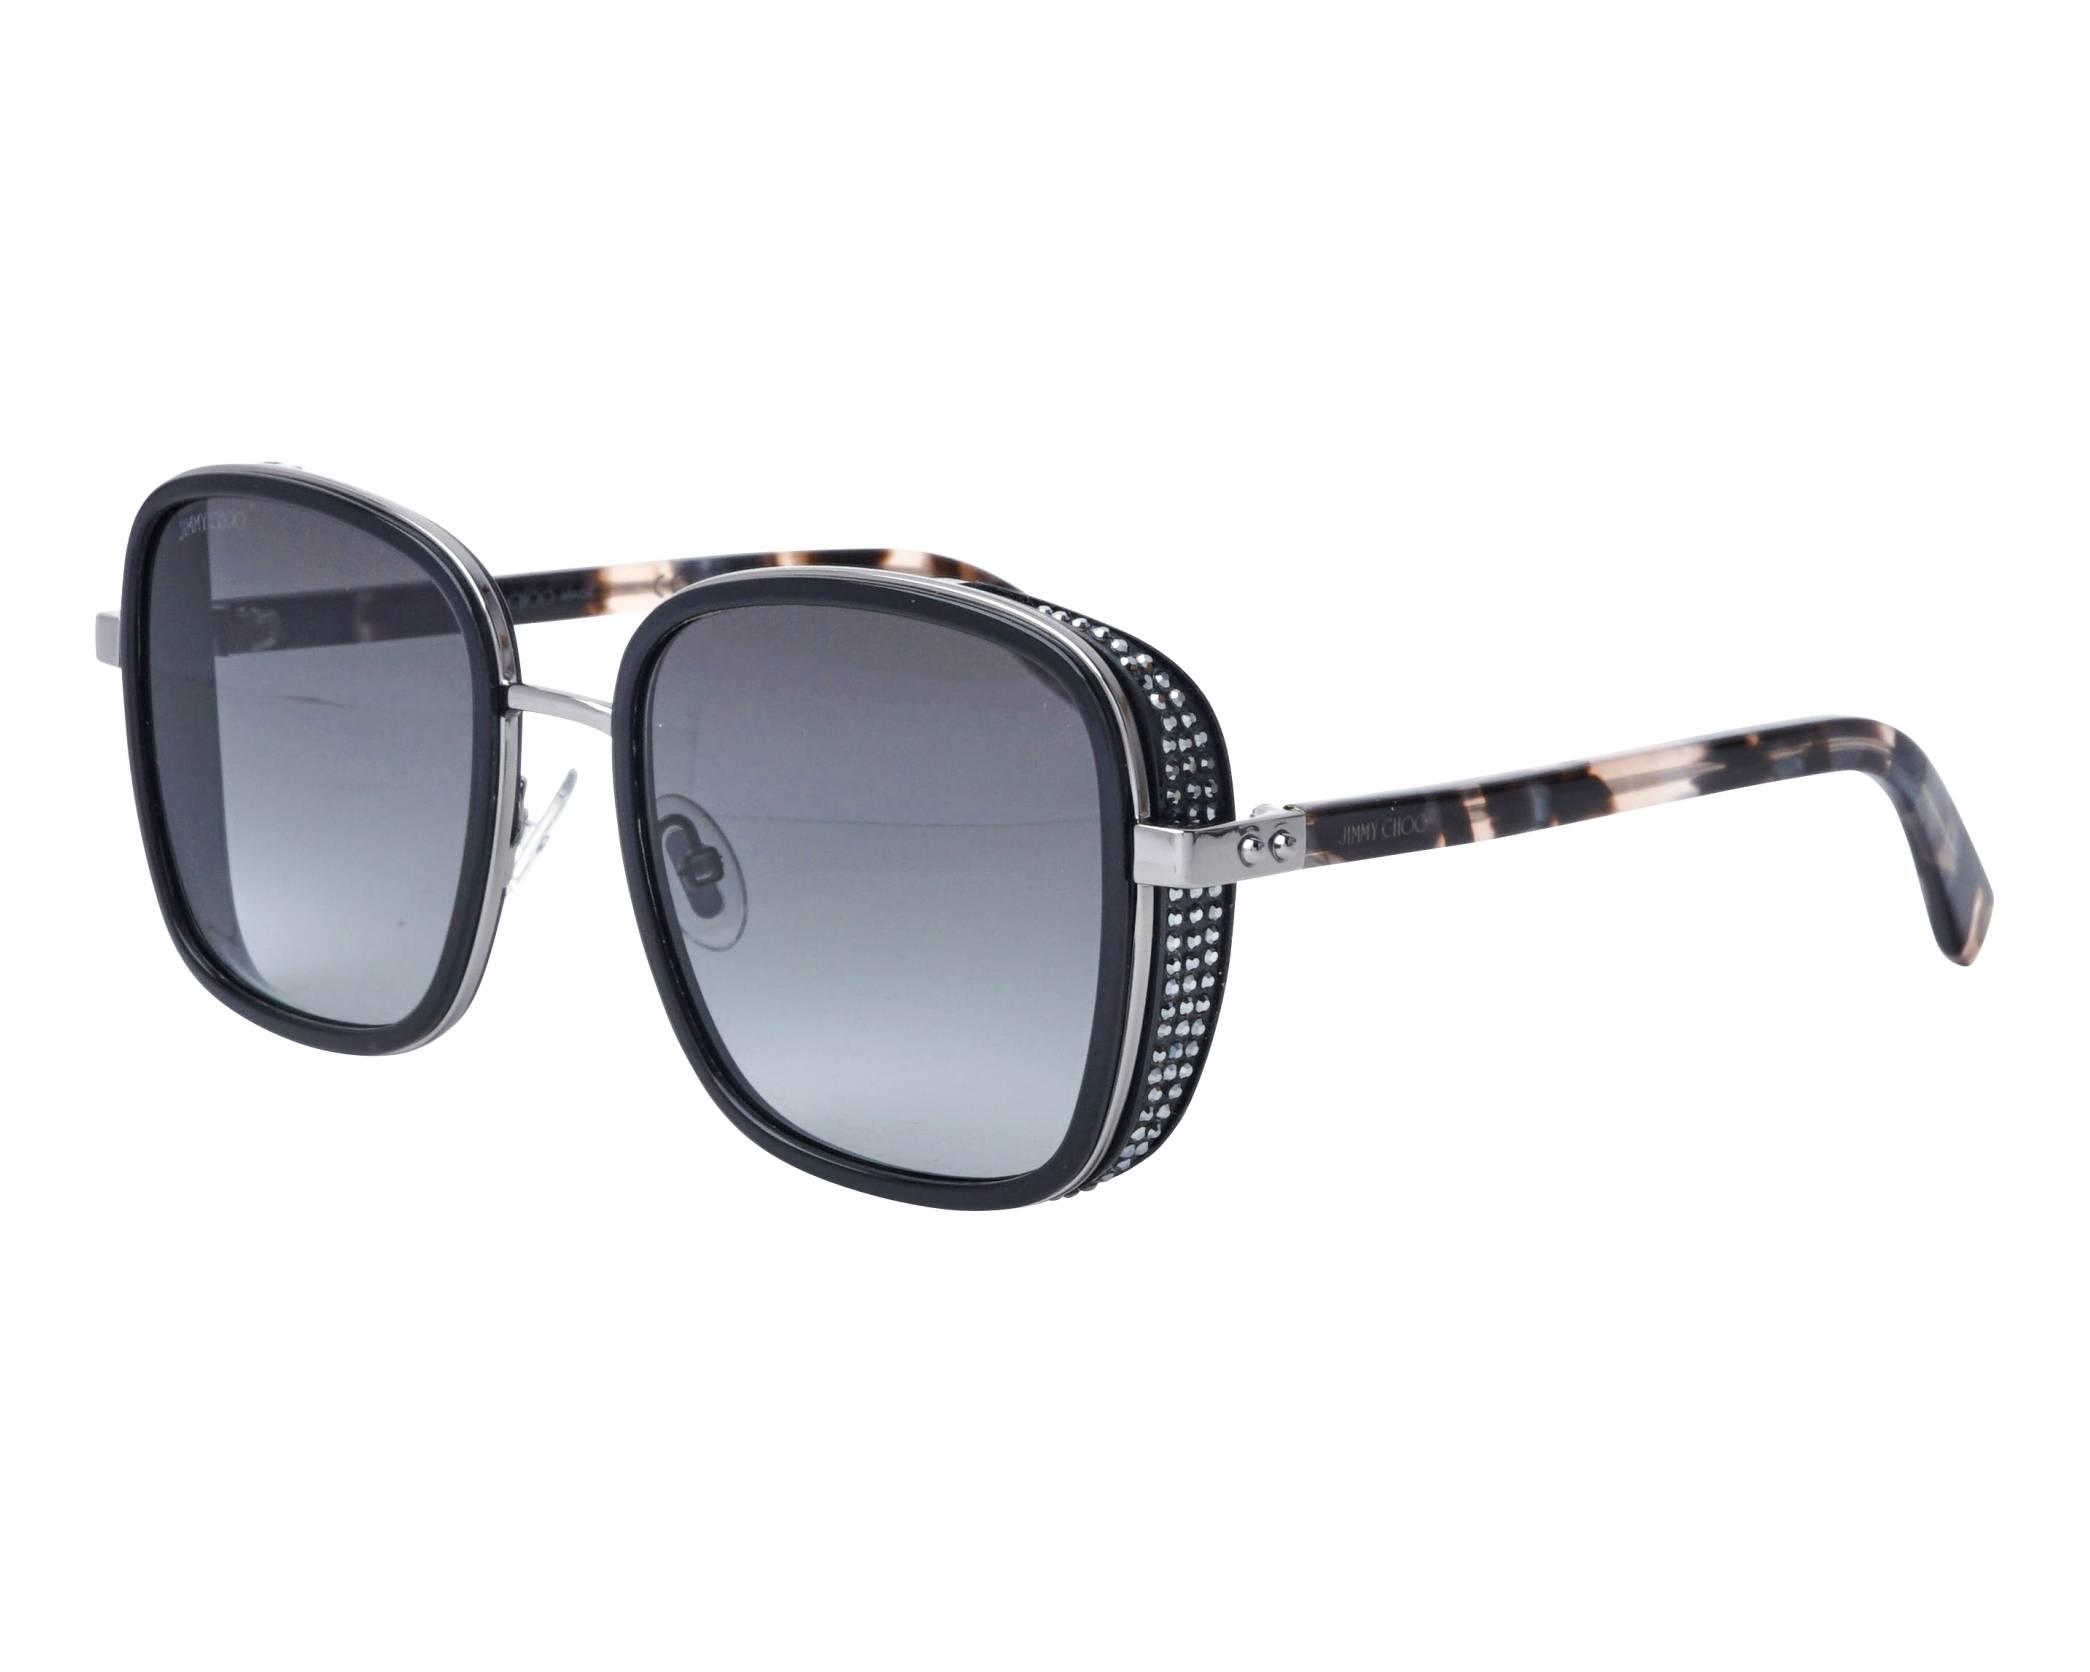 93010eb51f83 Sunglasses Jimmy Choo ELVA-S 80790 54-20 Black Gun profile view